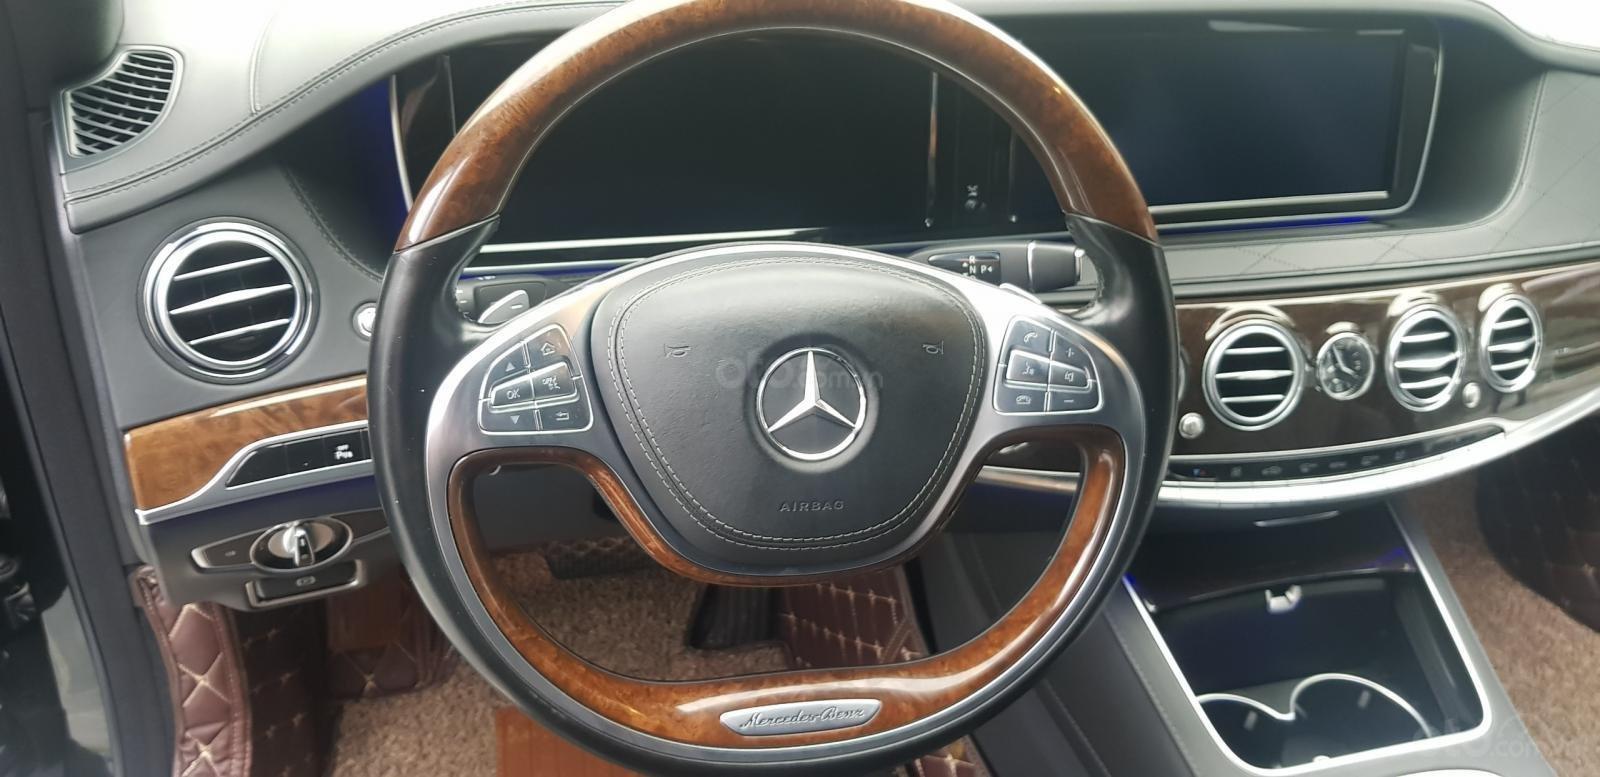 Bán Mercedes-Benz S500 SX 2016 màu đen, LH Ms  Hương 094.539.2468 (13)